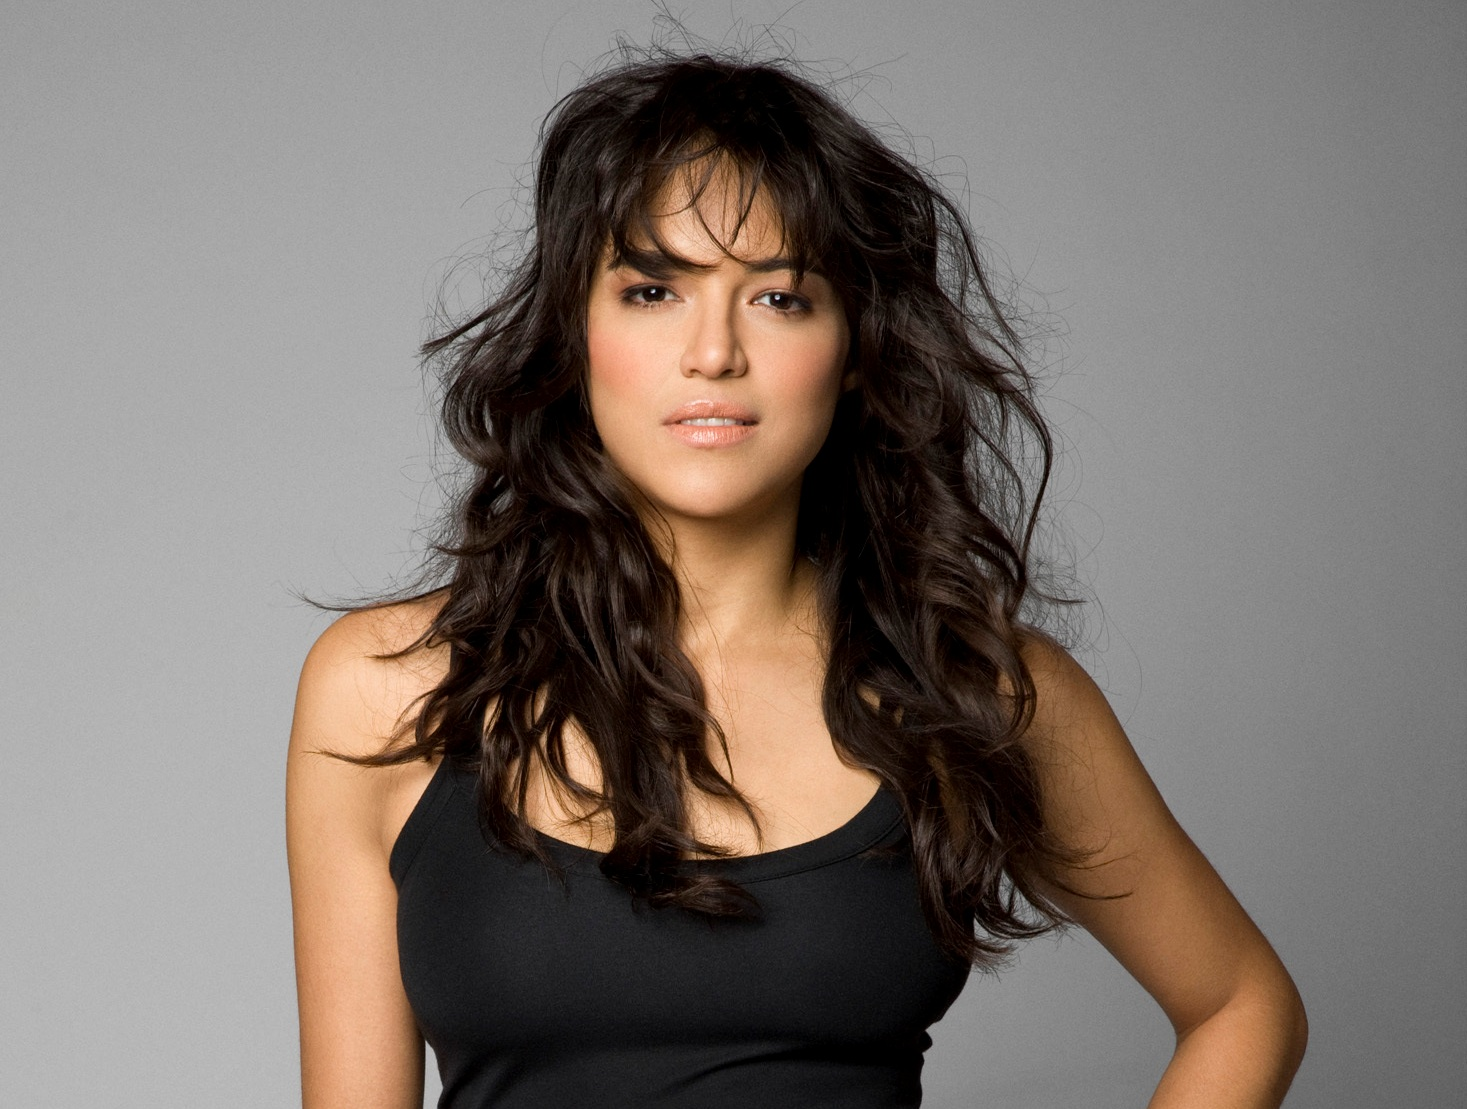 http://1.bp.blogspot.com/-bv5_cdmS-XA/T_bM9_xJ3pI/AAAAAAAAAnI/pCDkNADCAo0/s1600/Michelle+Rodriguez.jpg